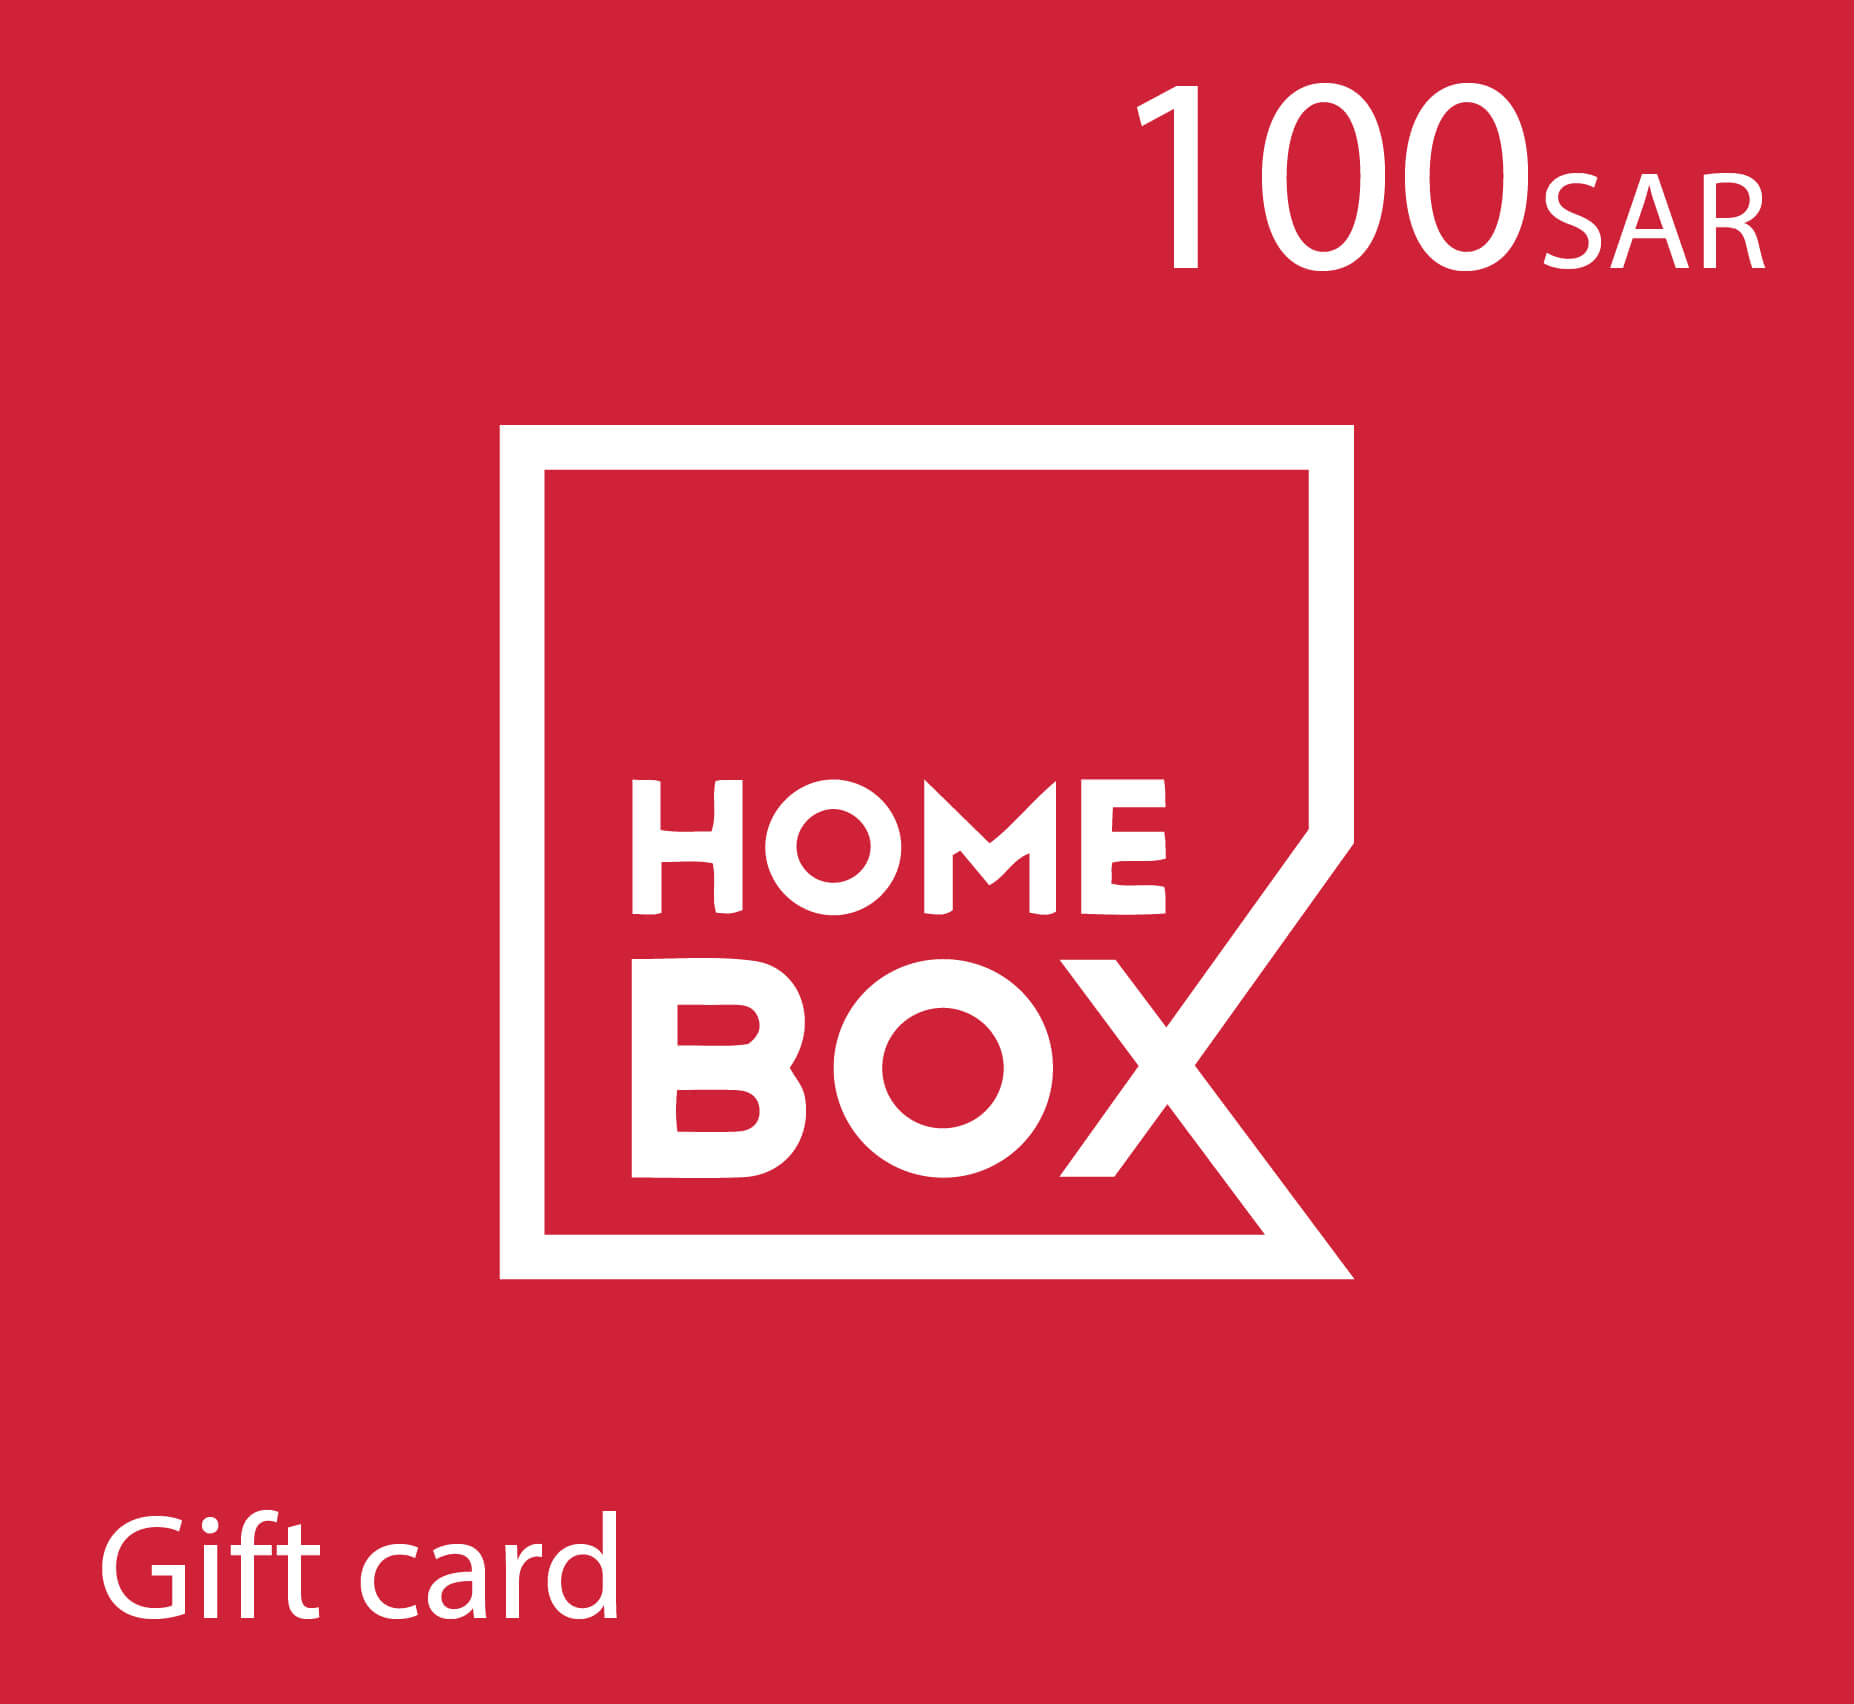 Home Box Gift Card - 100 SAR